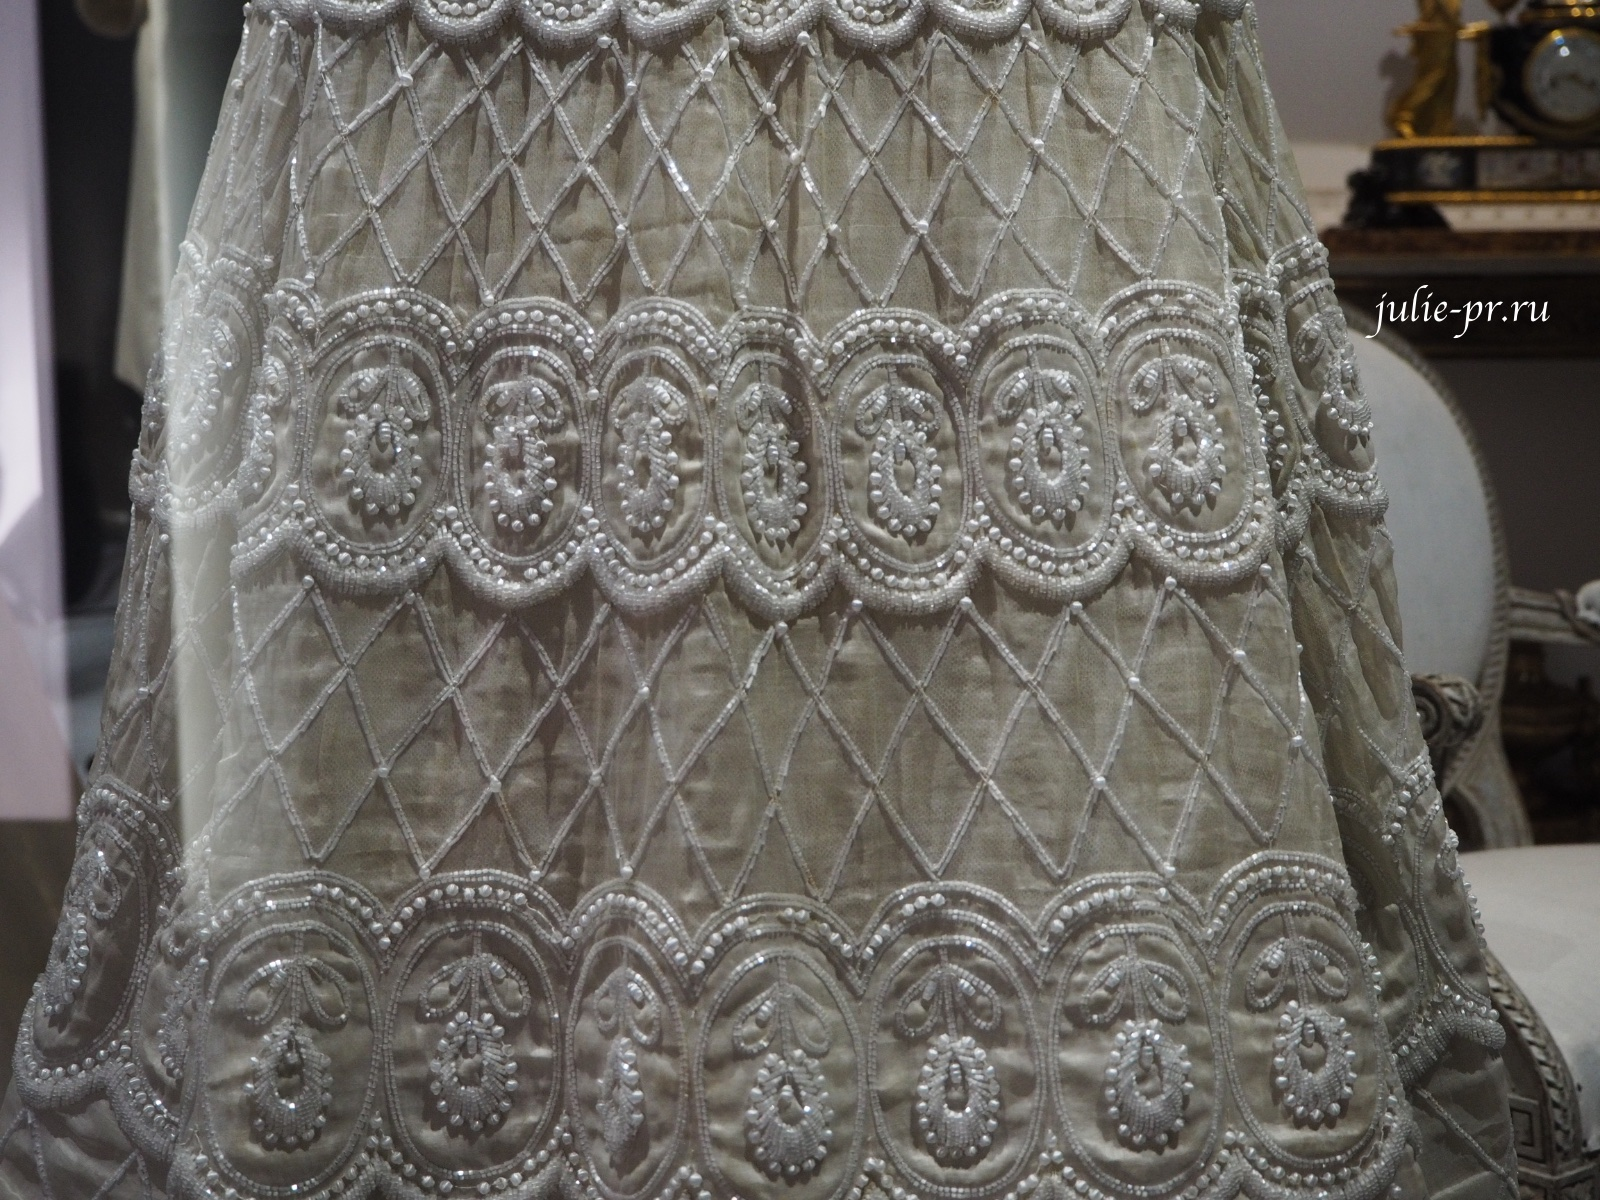 Платье Romance (Christian Dior Haute couture весна/лето 1956). Вышивка